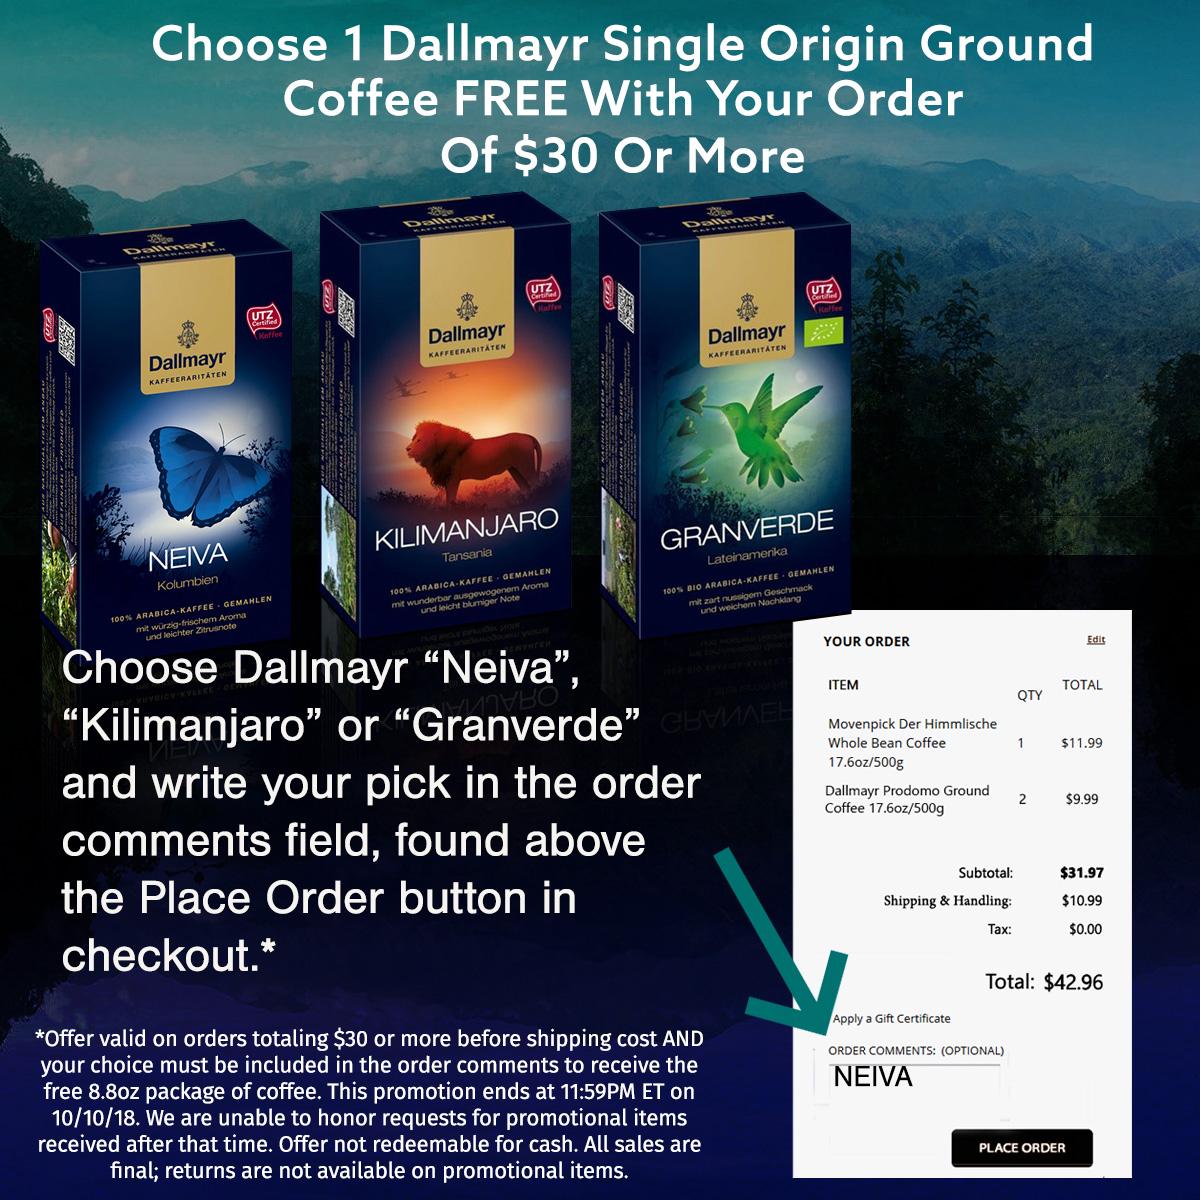 Dallmayr-Single-Origin-Choose-FS-NL-Final